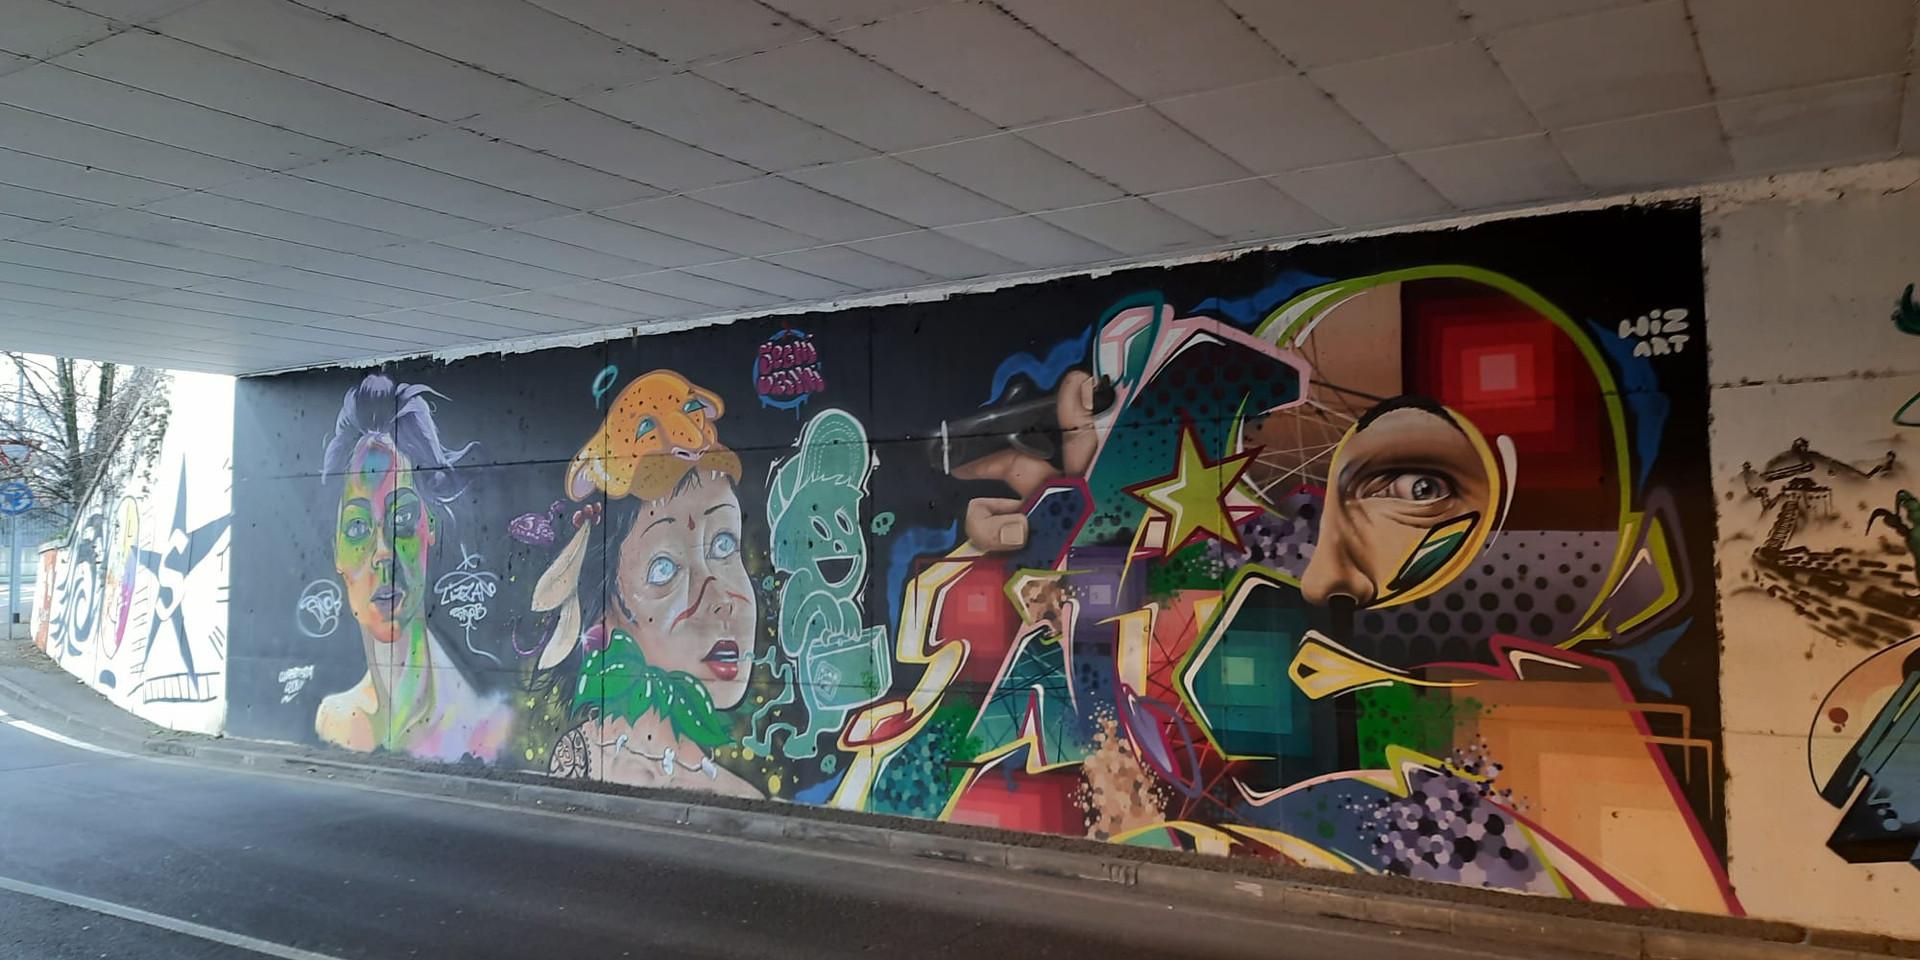 graffiti2.jpeg